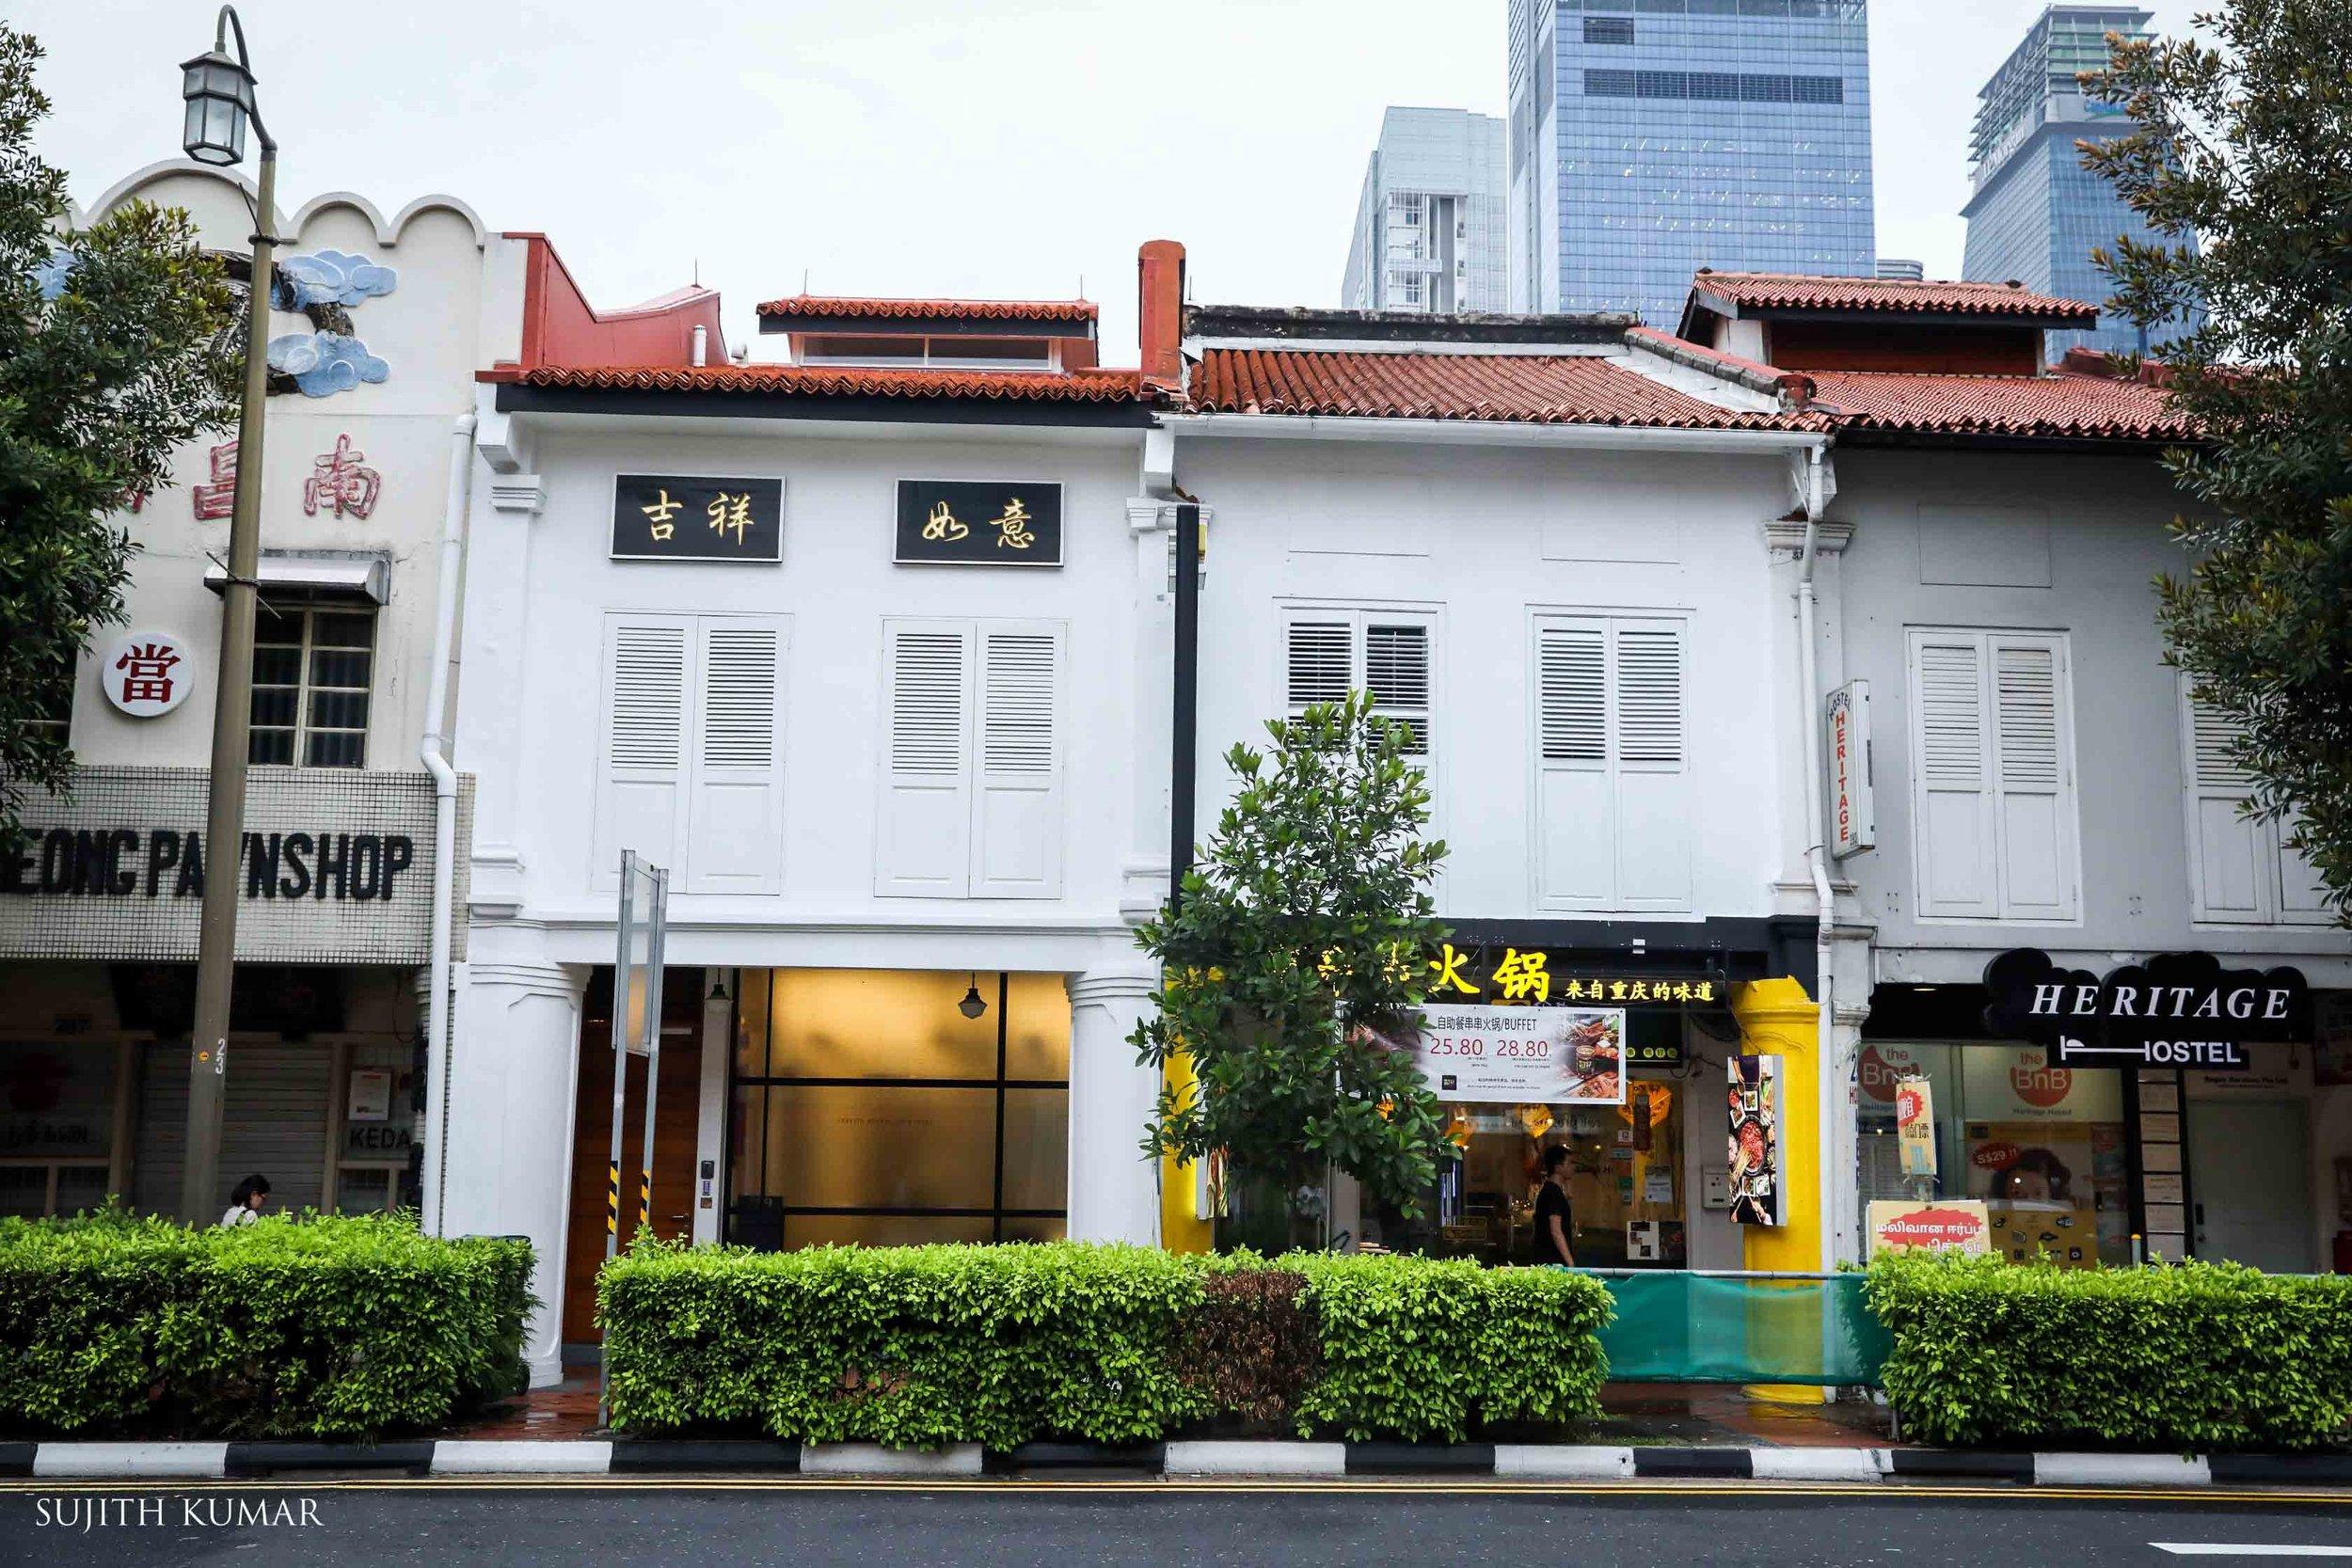 singapore streets.jpg